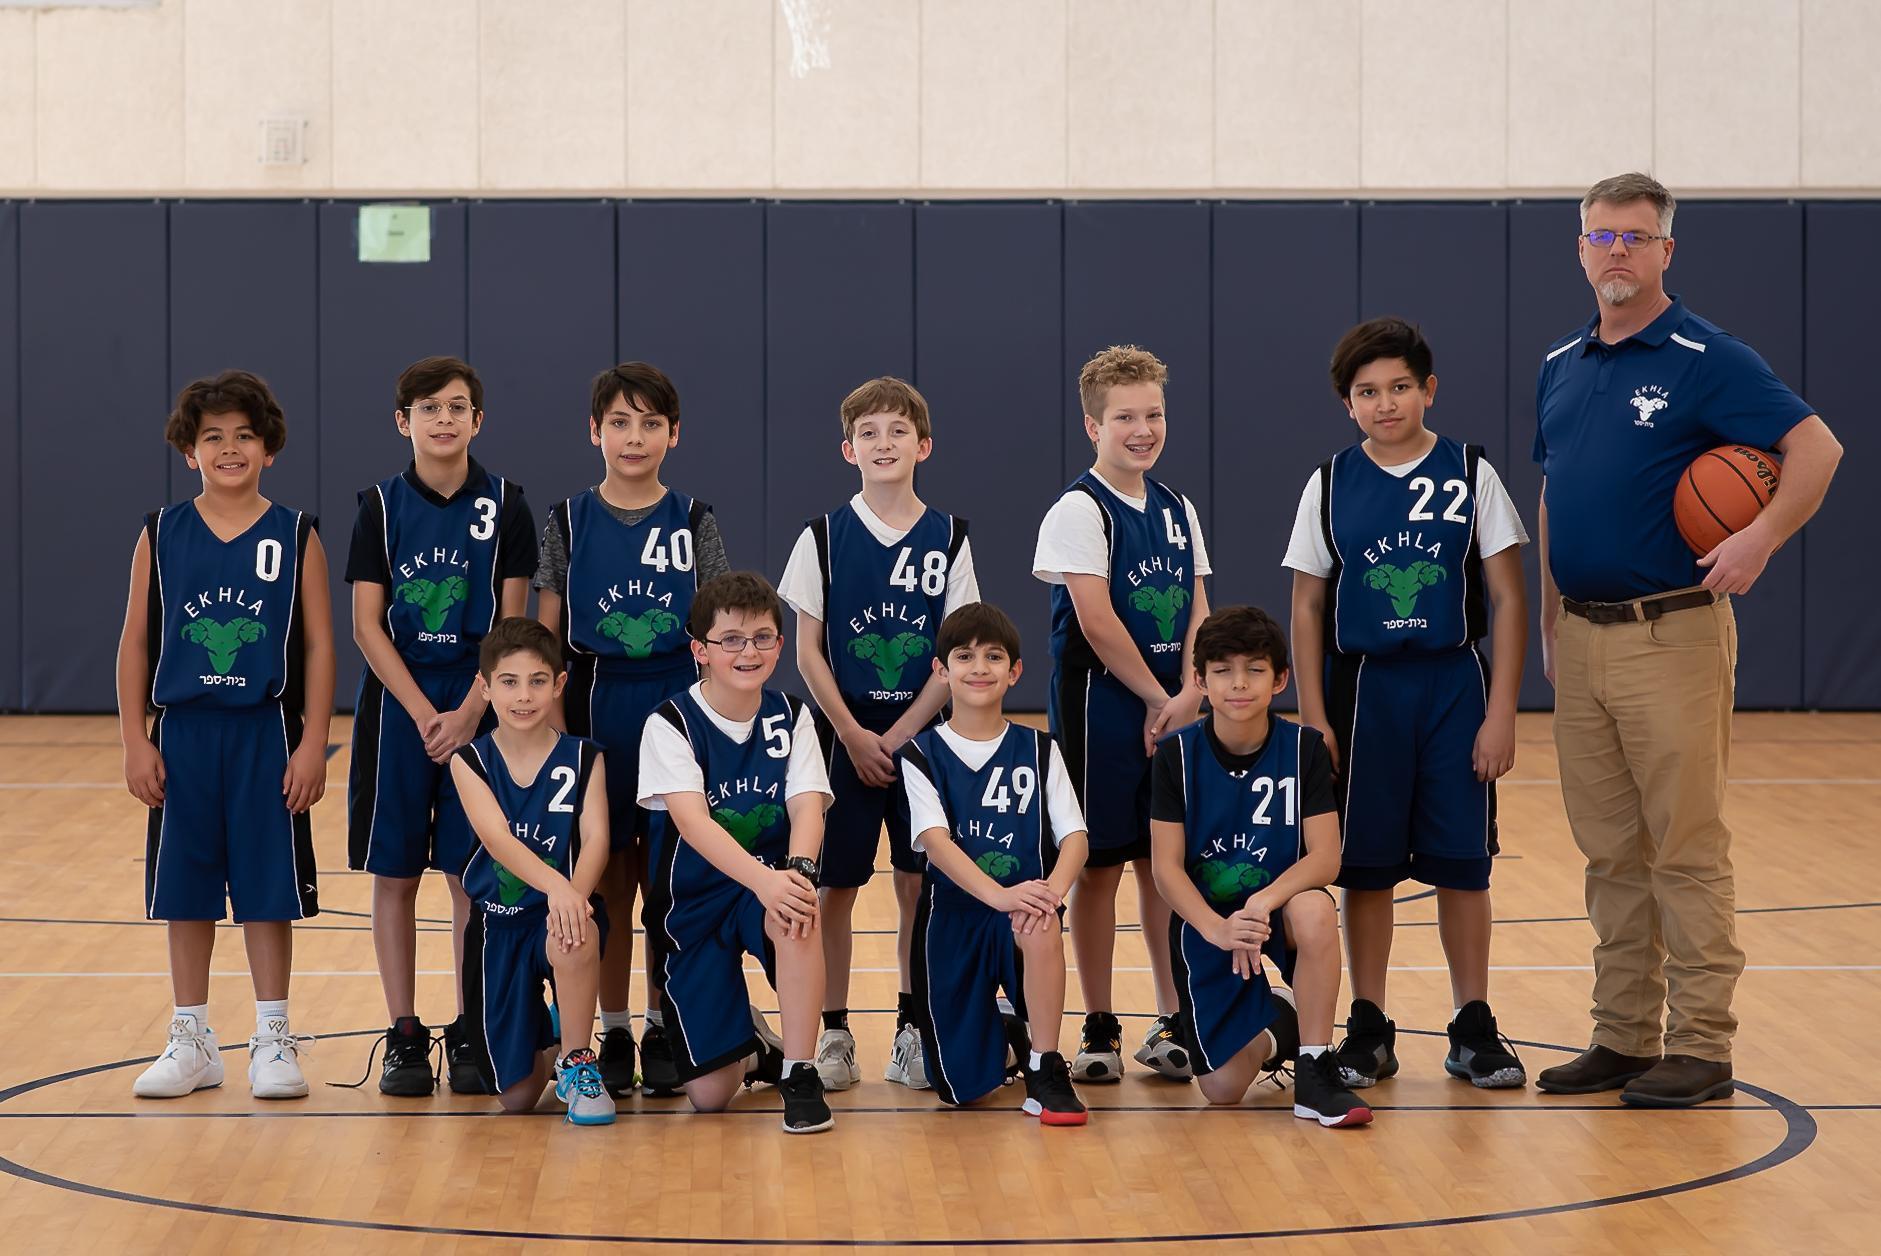 4-6 team